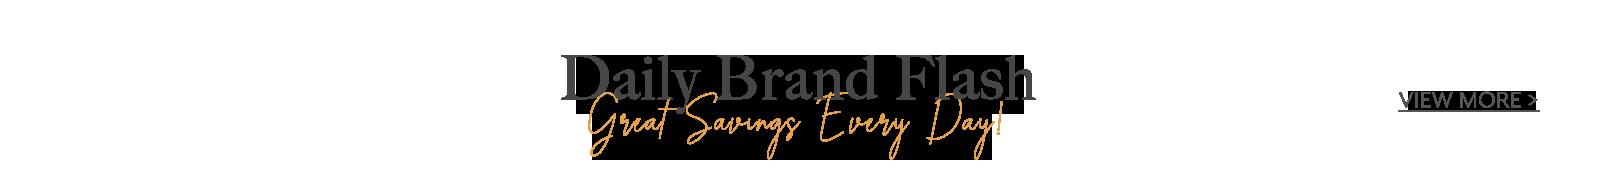 612 HERMO brandflash logo